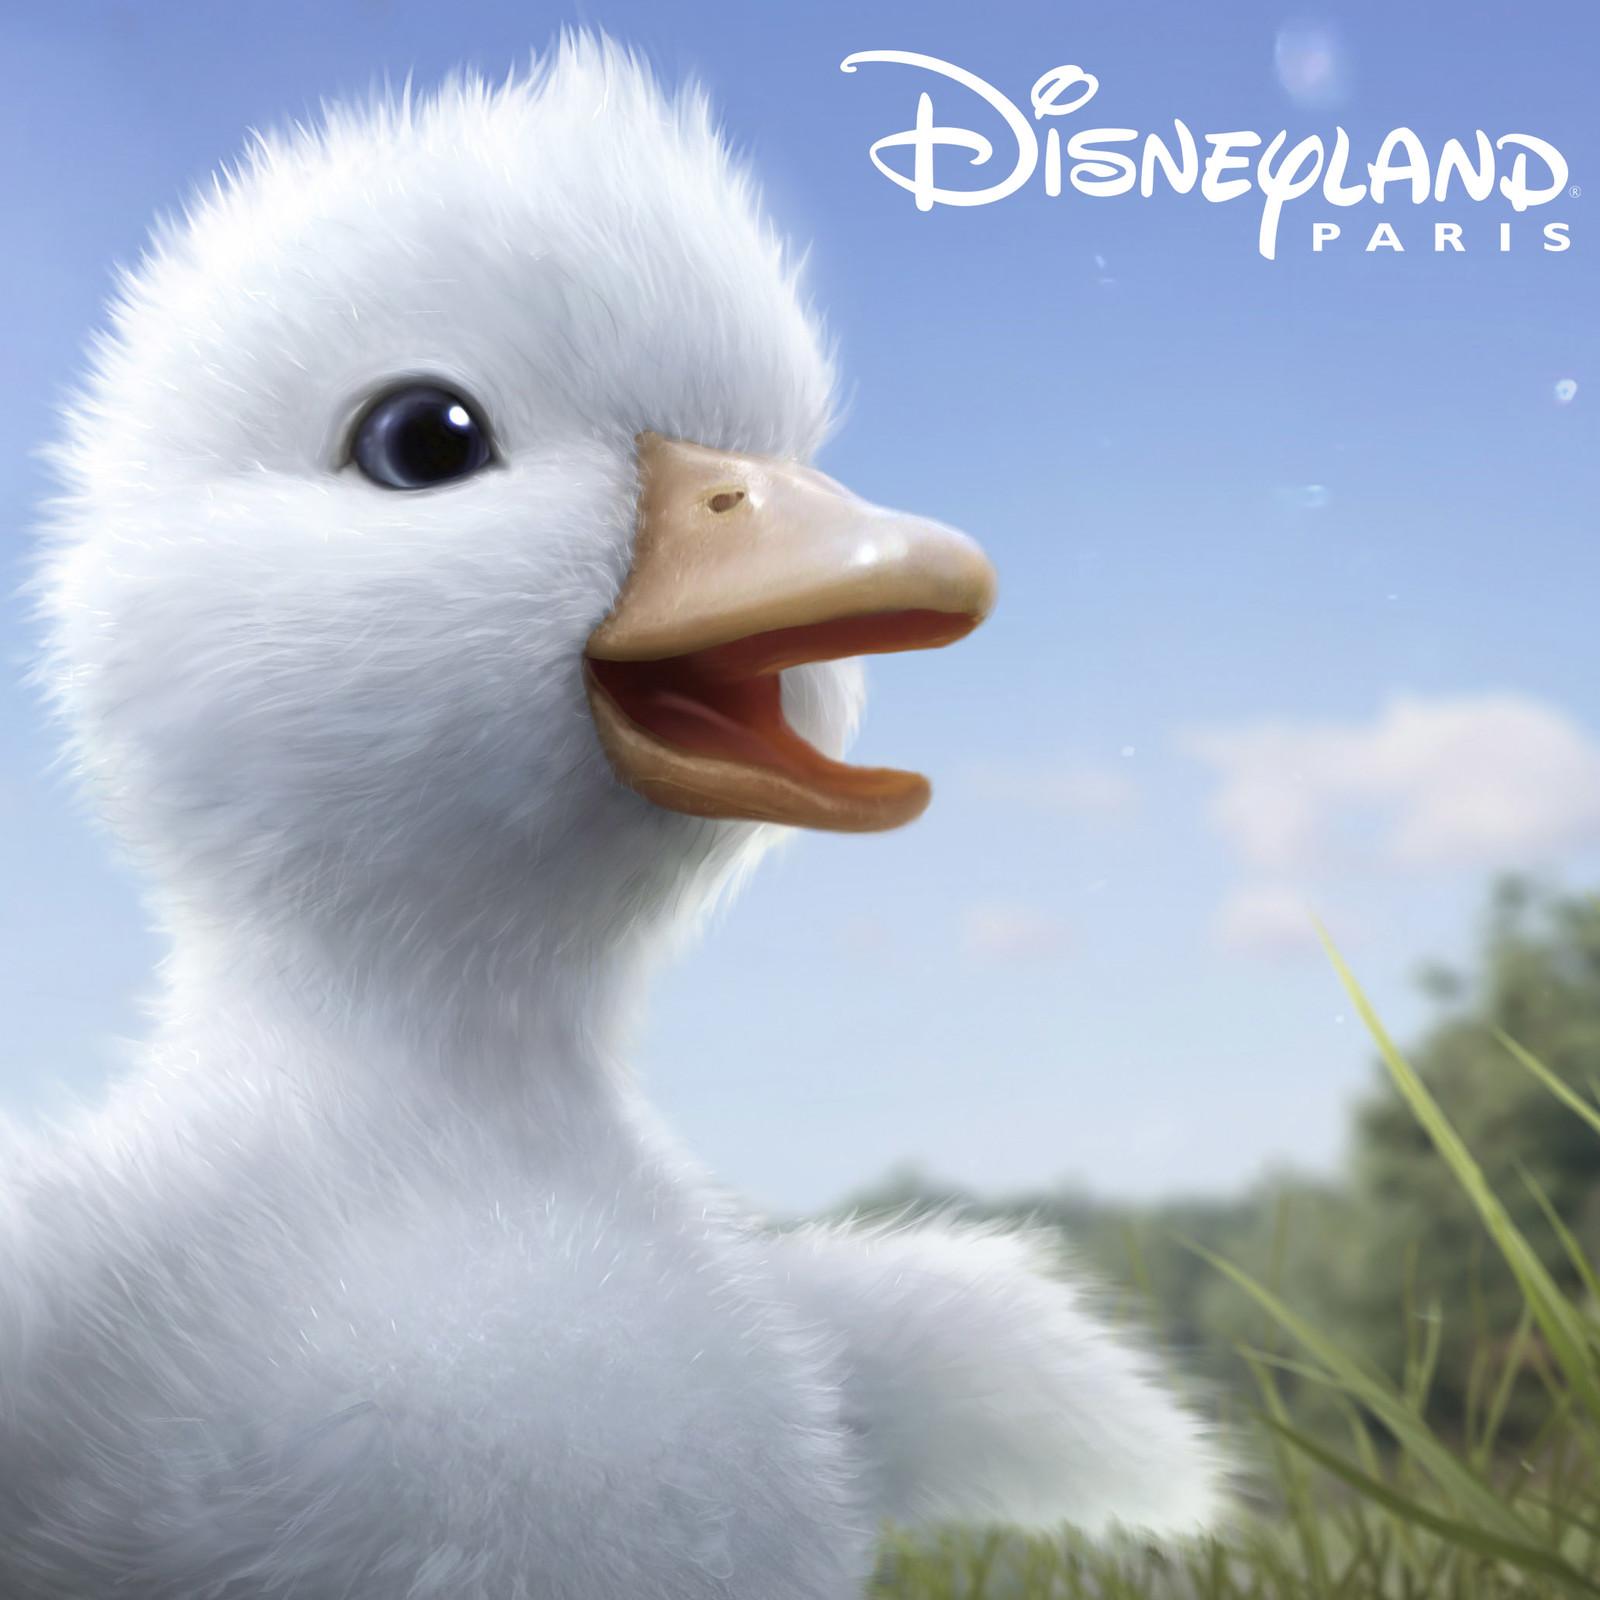 Disneyland - the little Duck - concept art